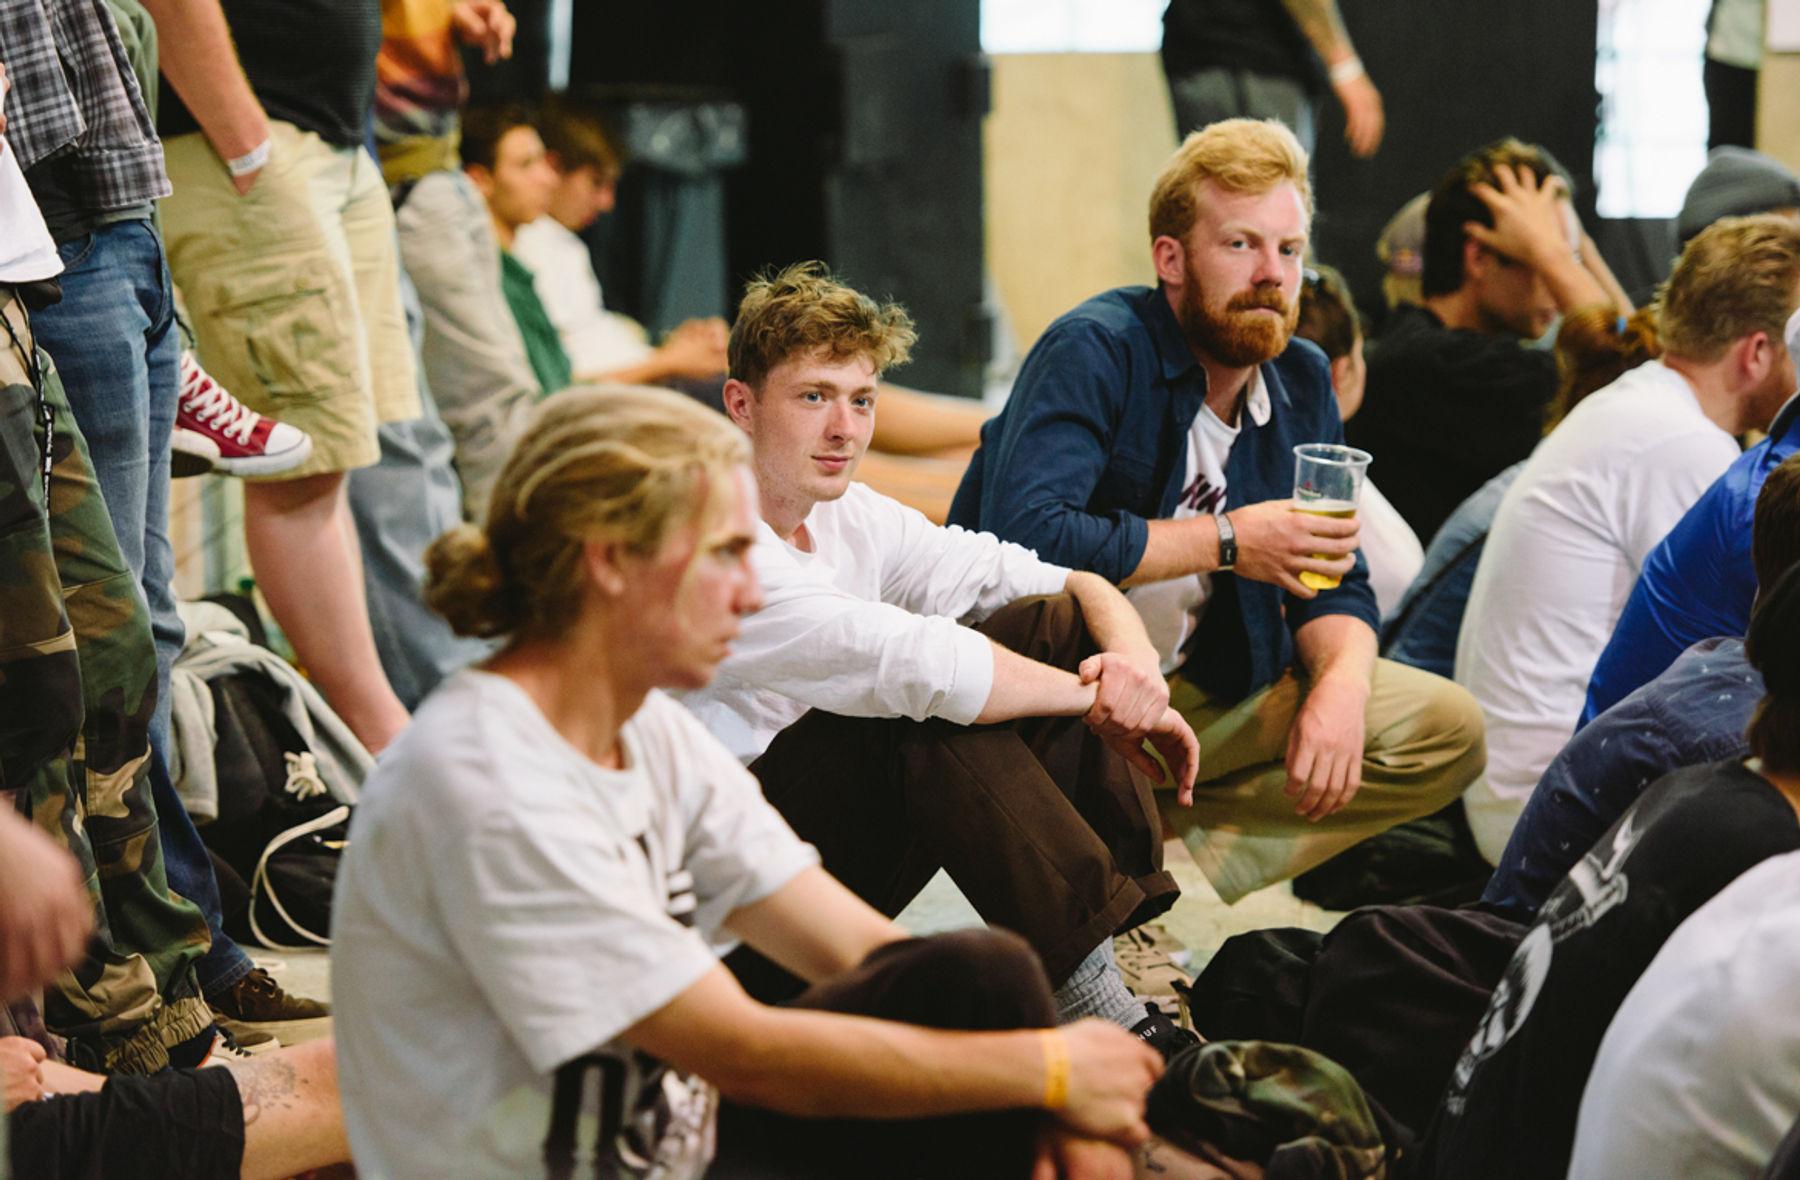 _IHC1514-Jacob-Harris-Magnus-Kreiberg-Nike-SB-Berlin-Open-Day-1-July-2015-Photographer-Maksim-Kalanep